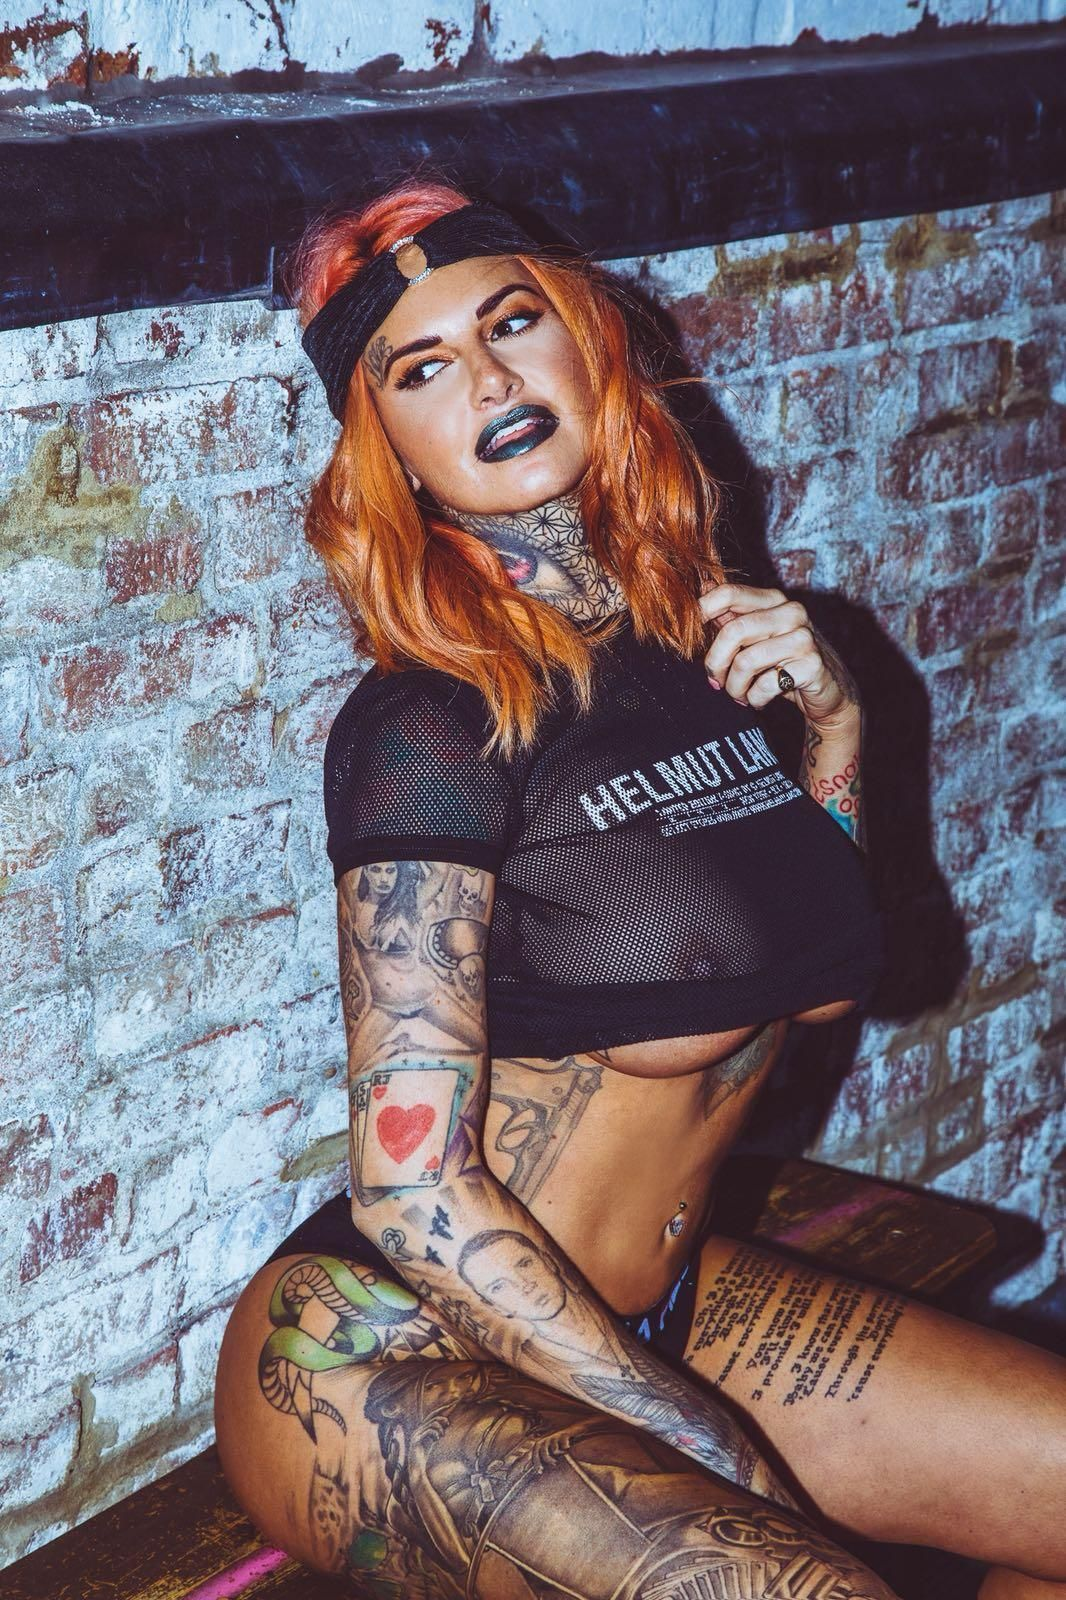 Hot Snapchat Sofia Vergara naked photo 2017